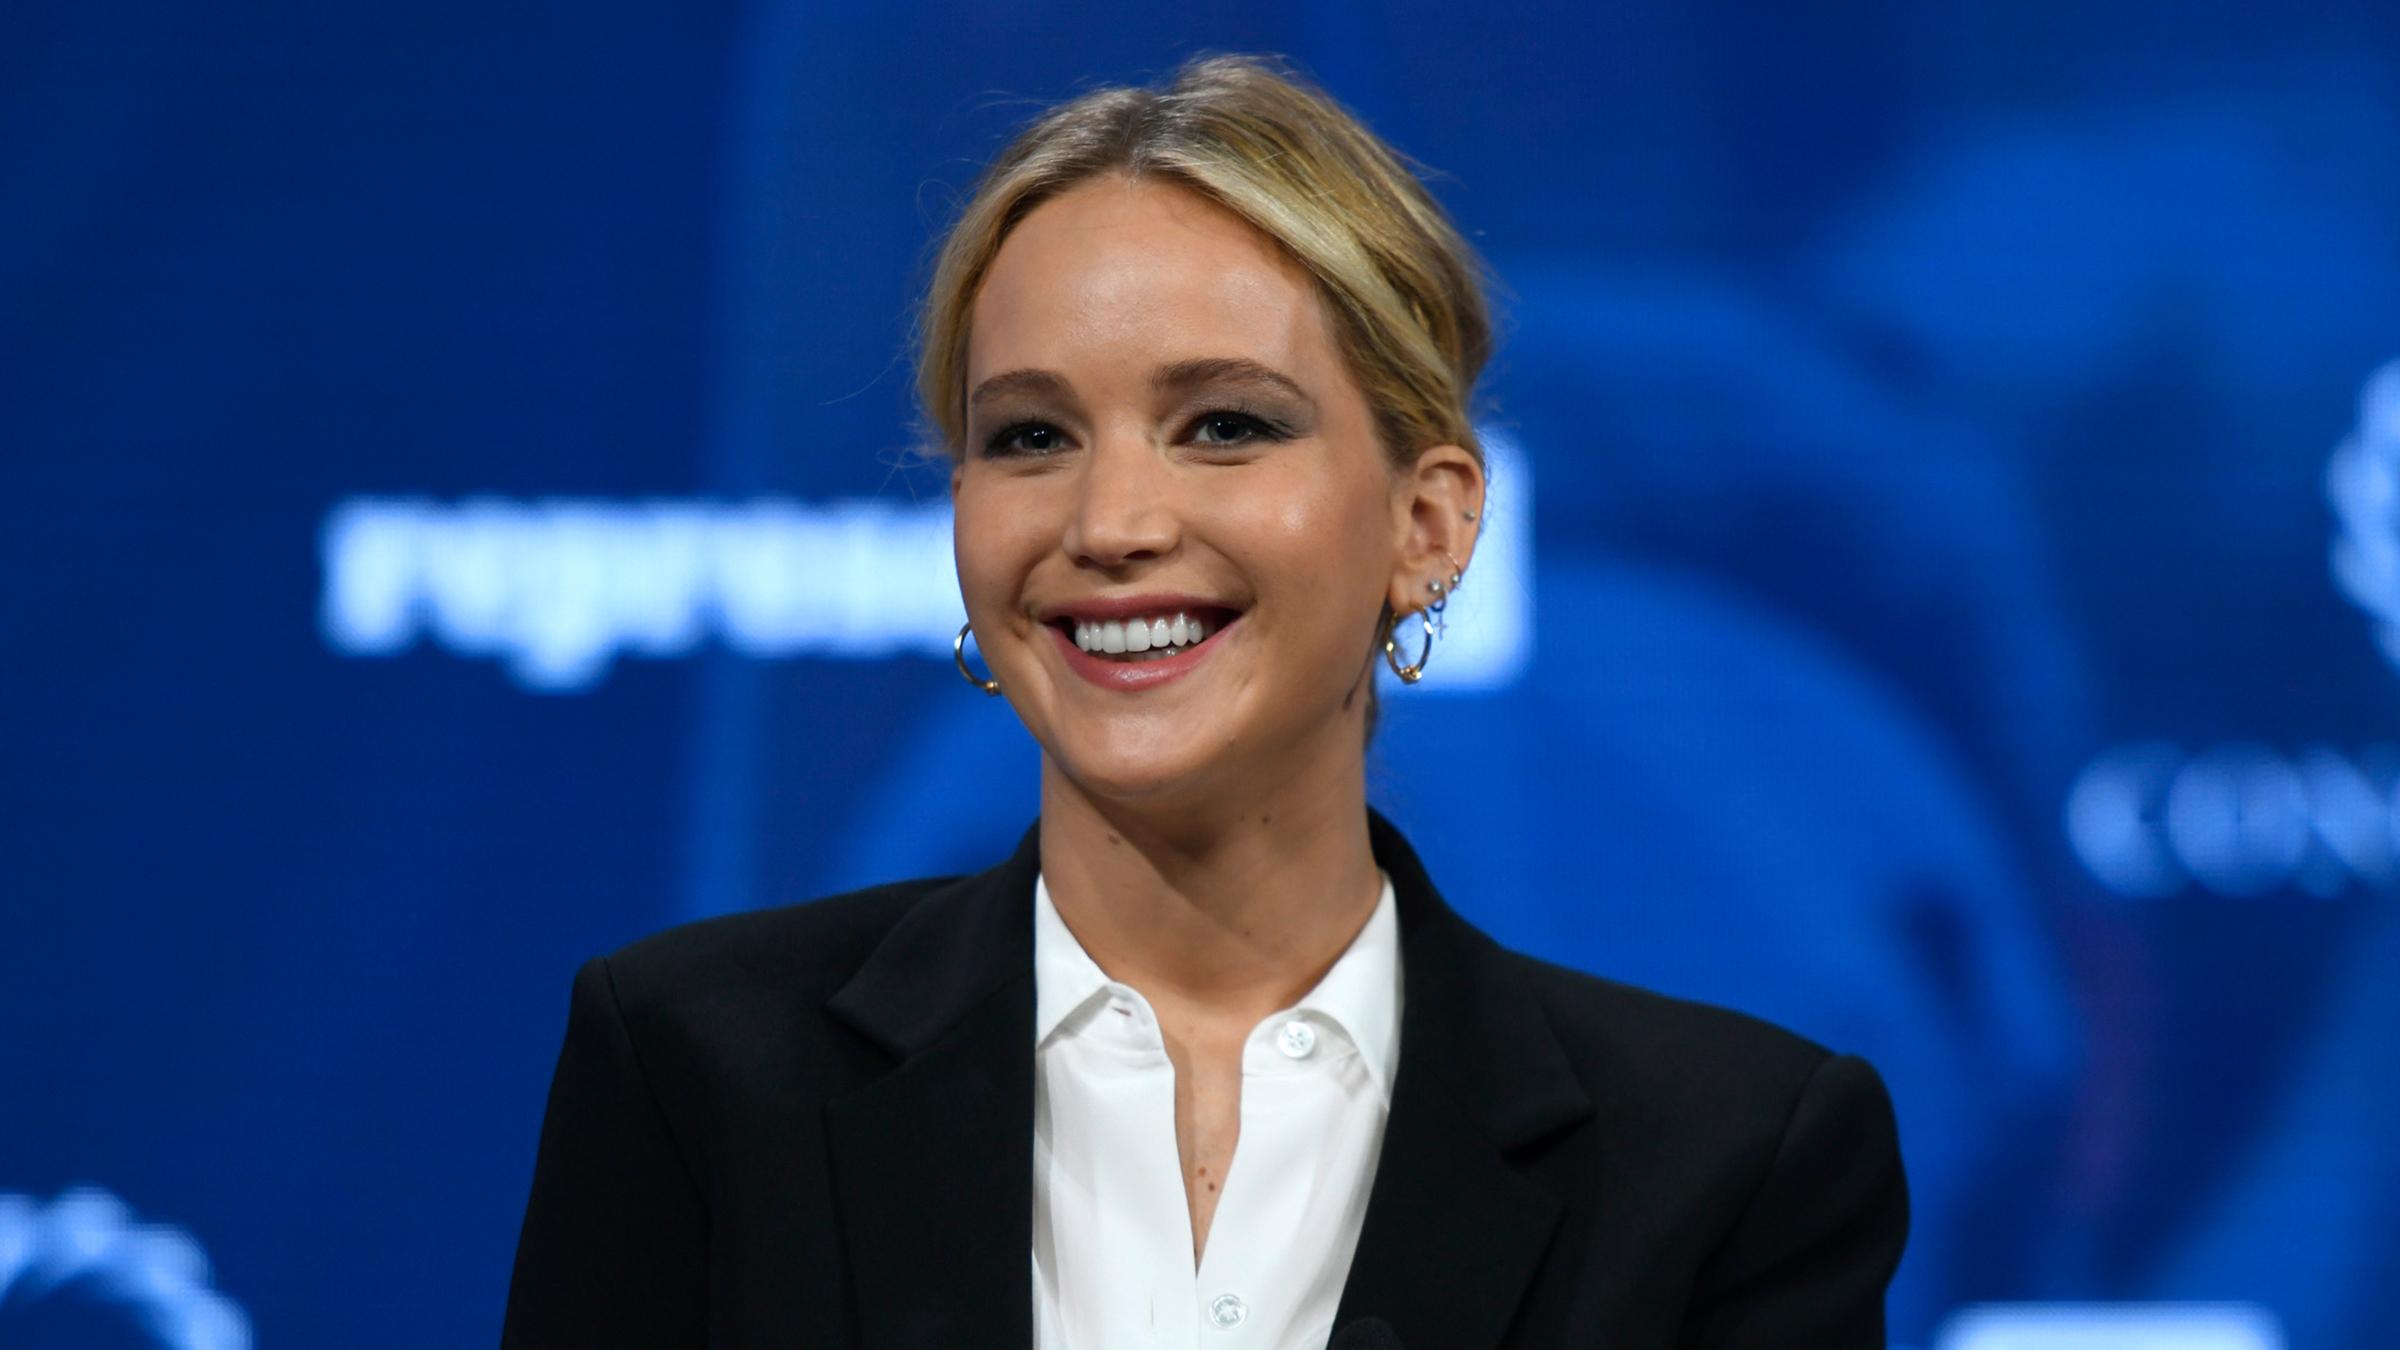 Jennifer Lawrence Got Into A Hilarious Bathroom Altercation